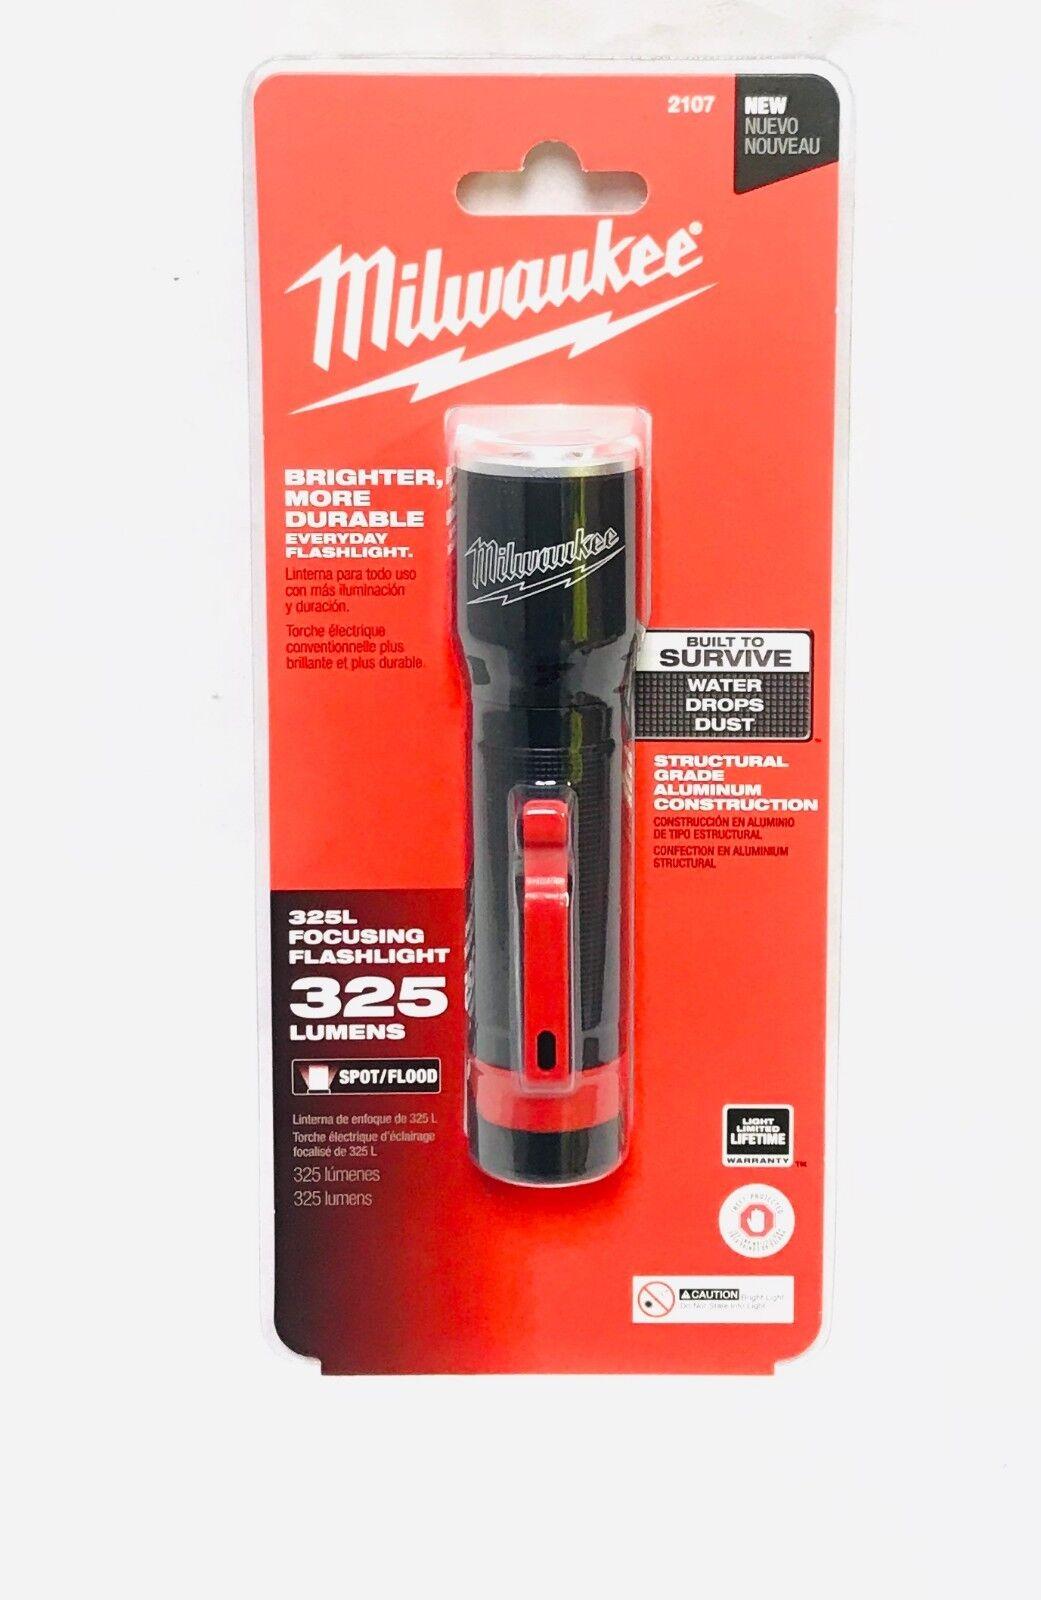 Milwaukee 2107 325L Focusing Flashlight New